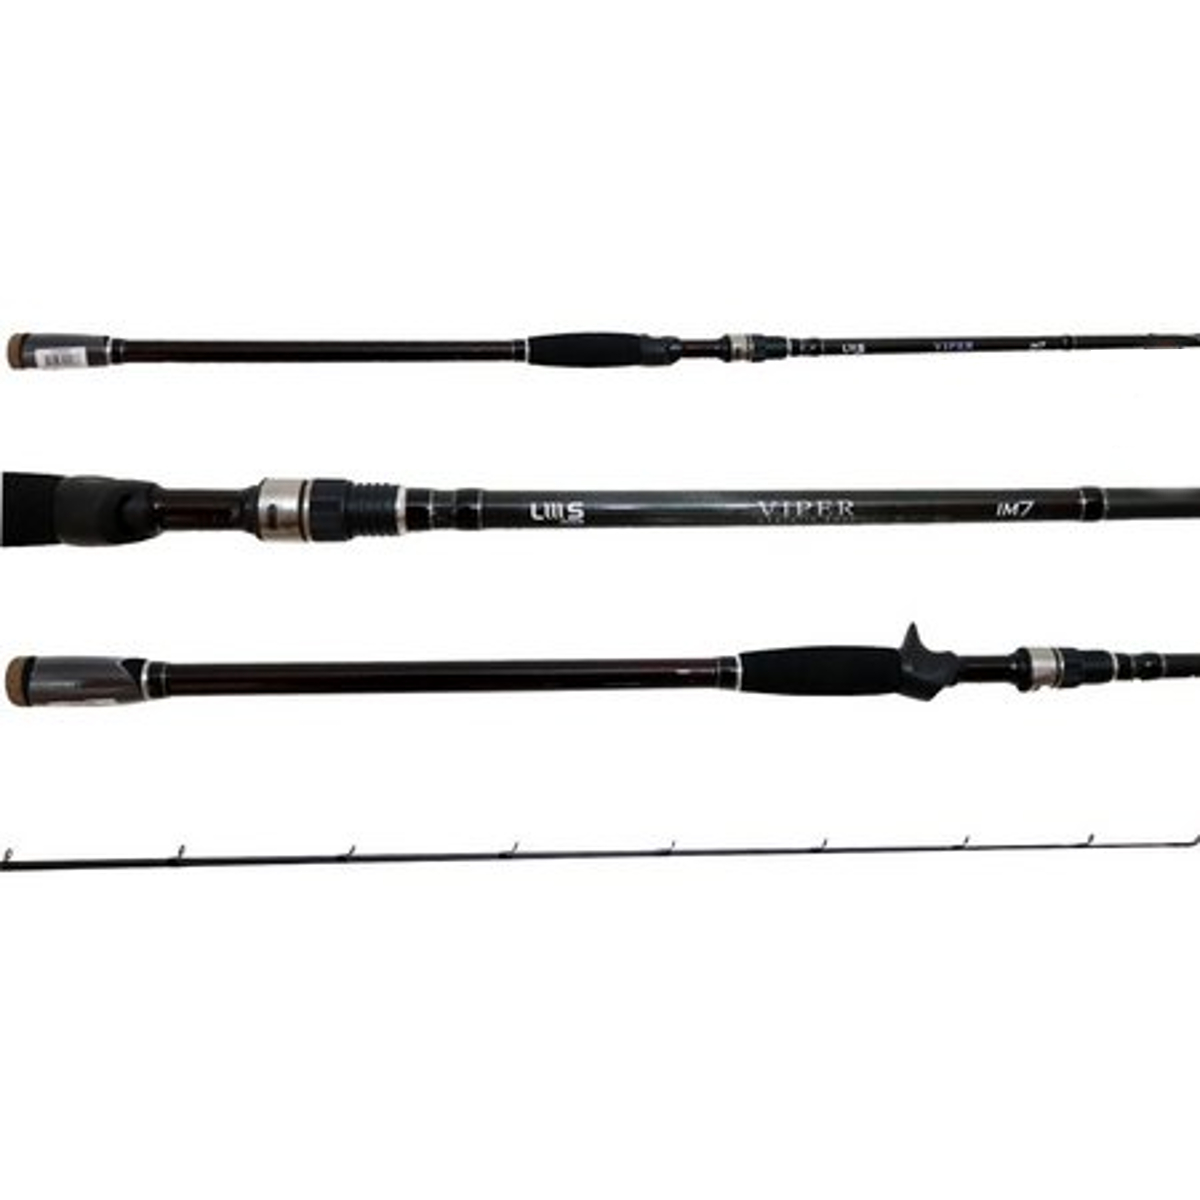 Vara Lumis Viper 562 (1,68m) 6-17lb Carretilha 2 Partes  - Pesca Adventure